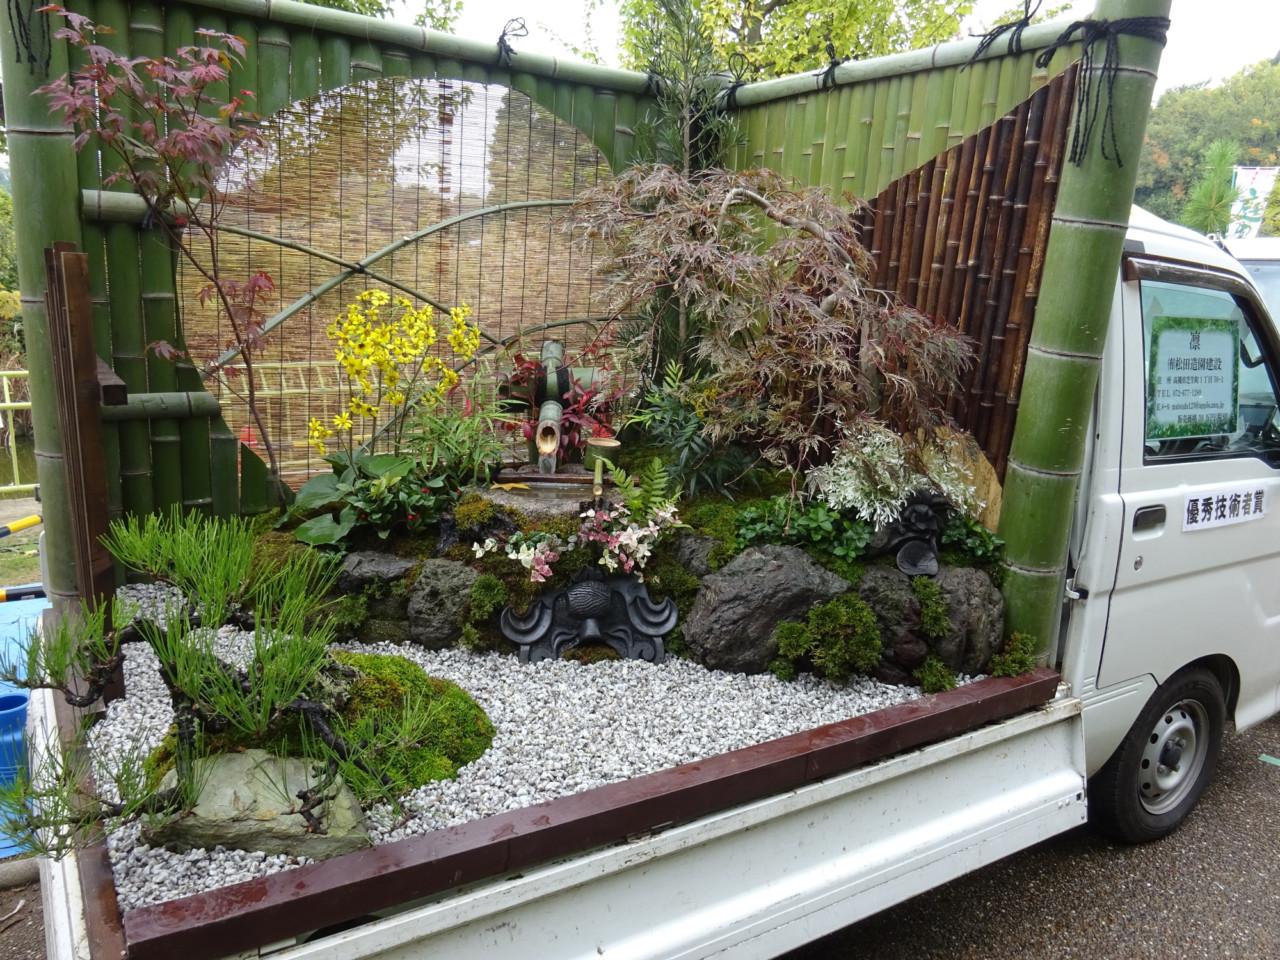 truck-garden-6-640x480@2x